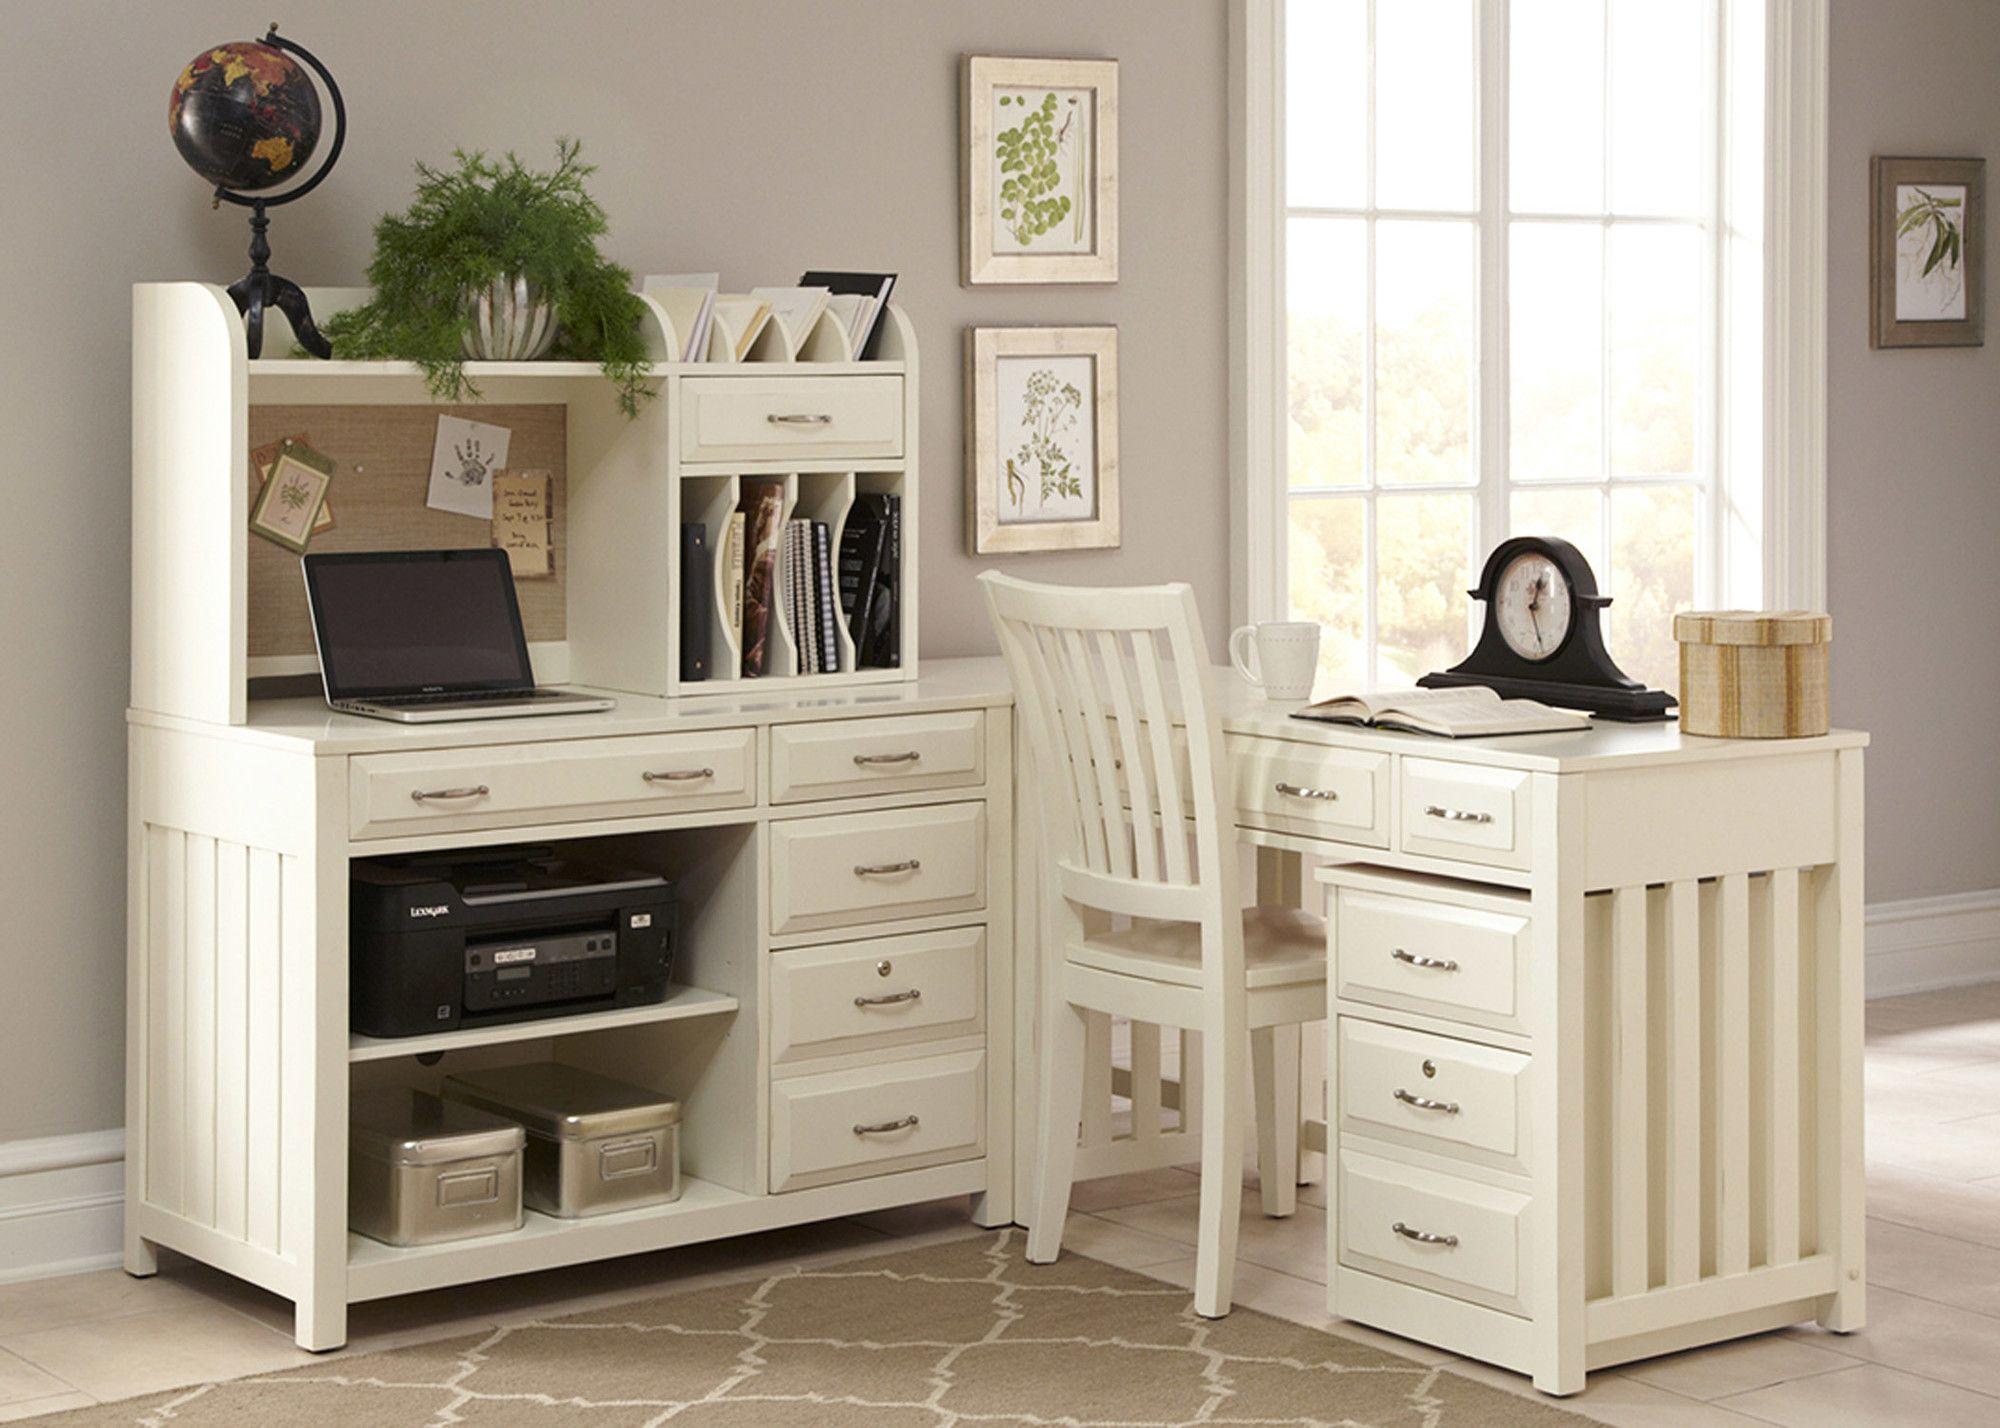 Computer Credenza Desk   Wayfair   Decorating-Office   Pinterest ...